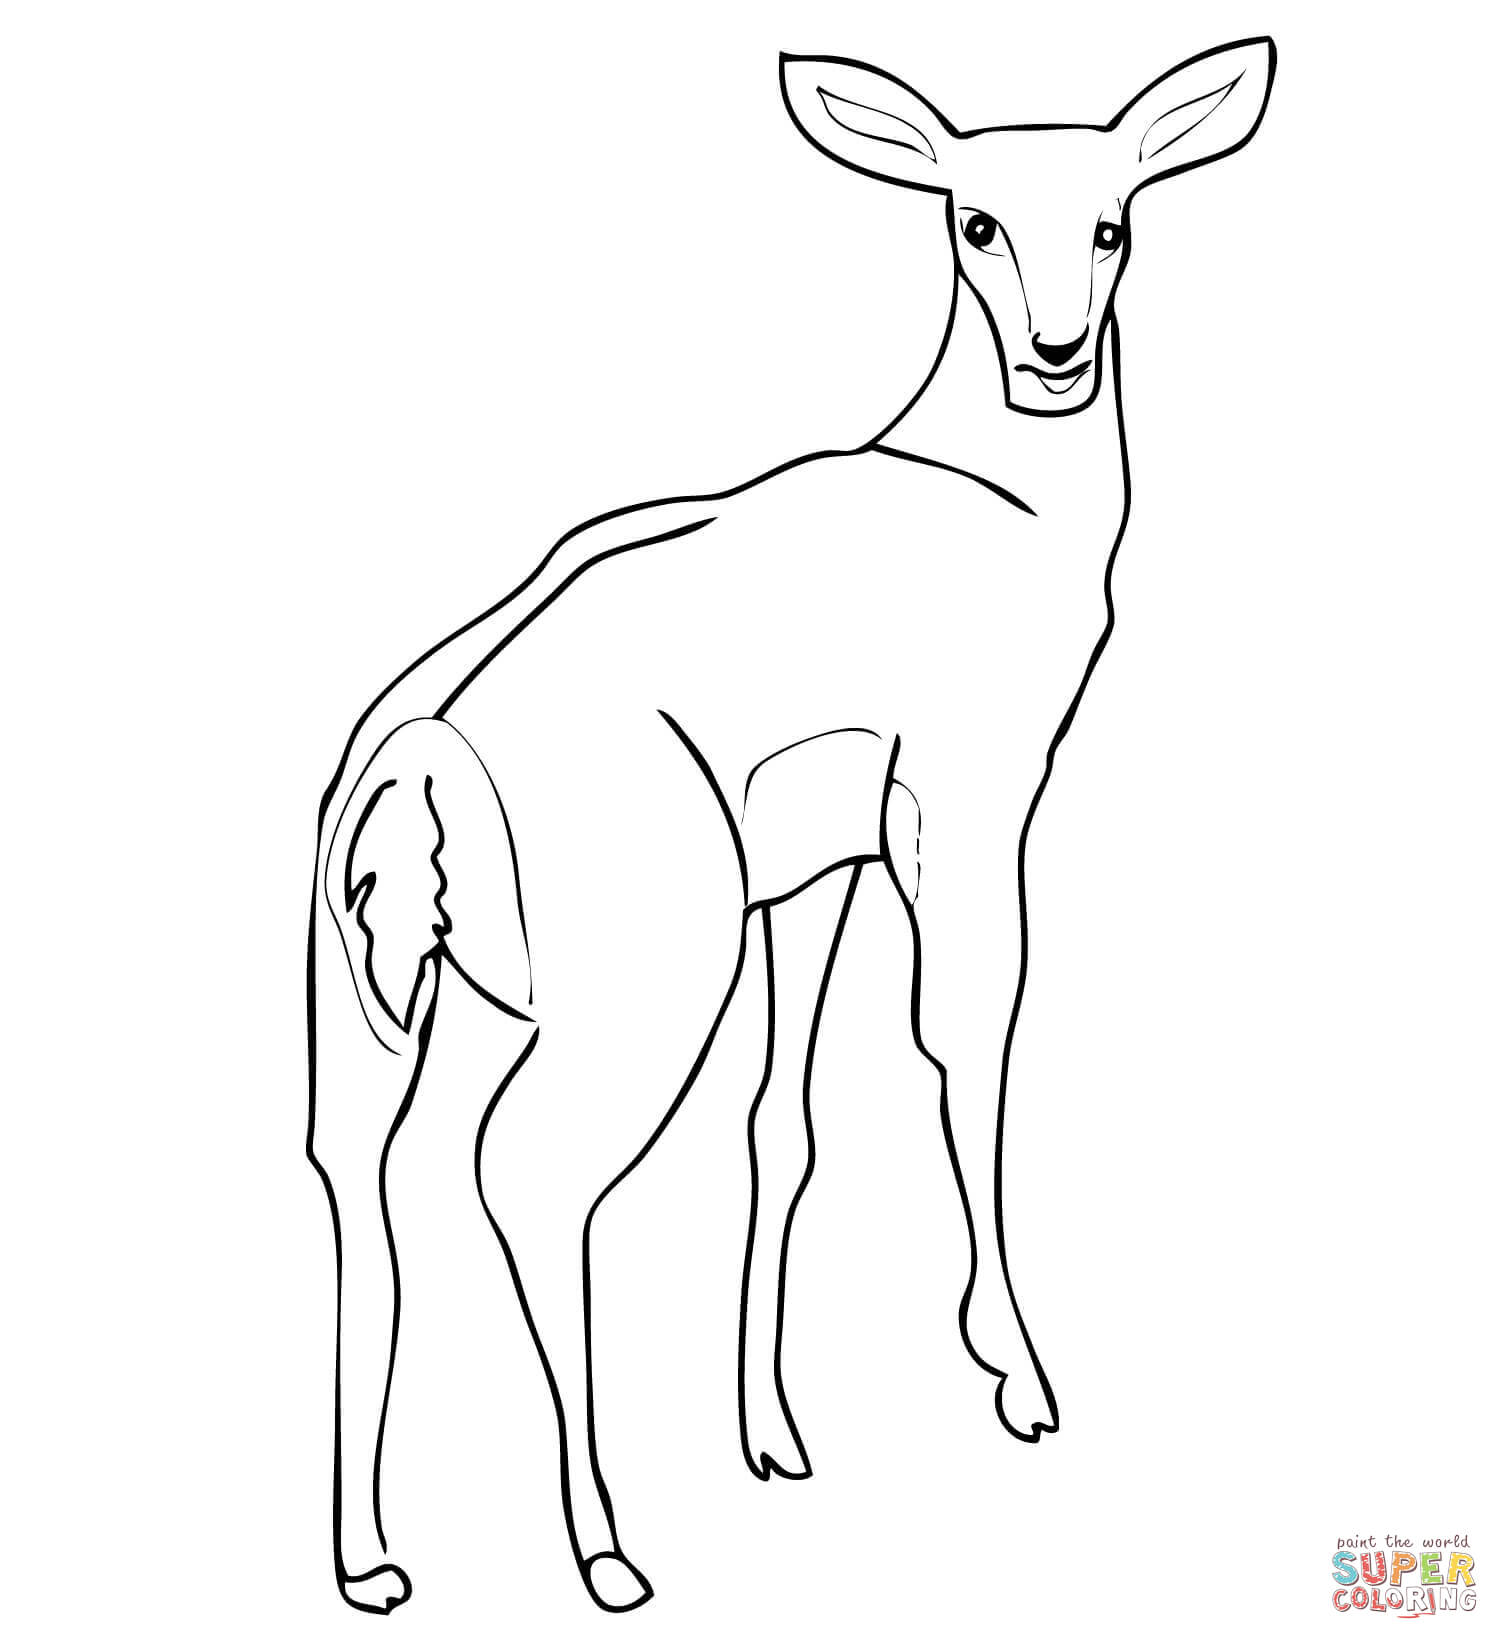 Female Impala Antelope Coloring Page